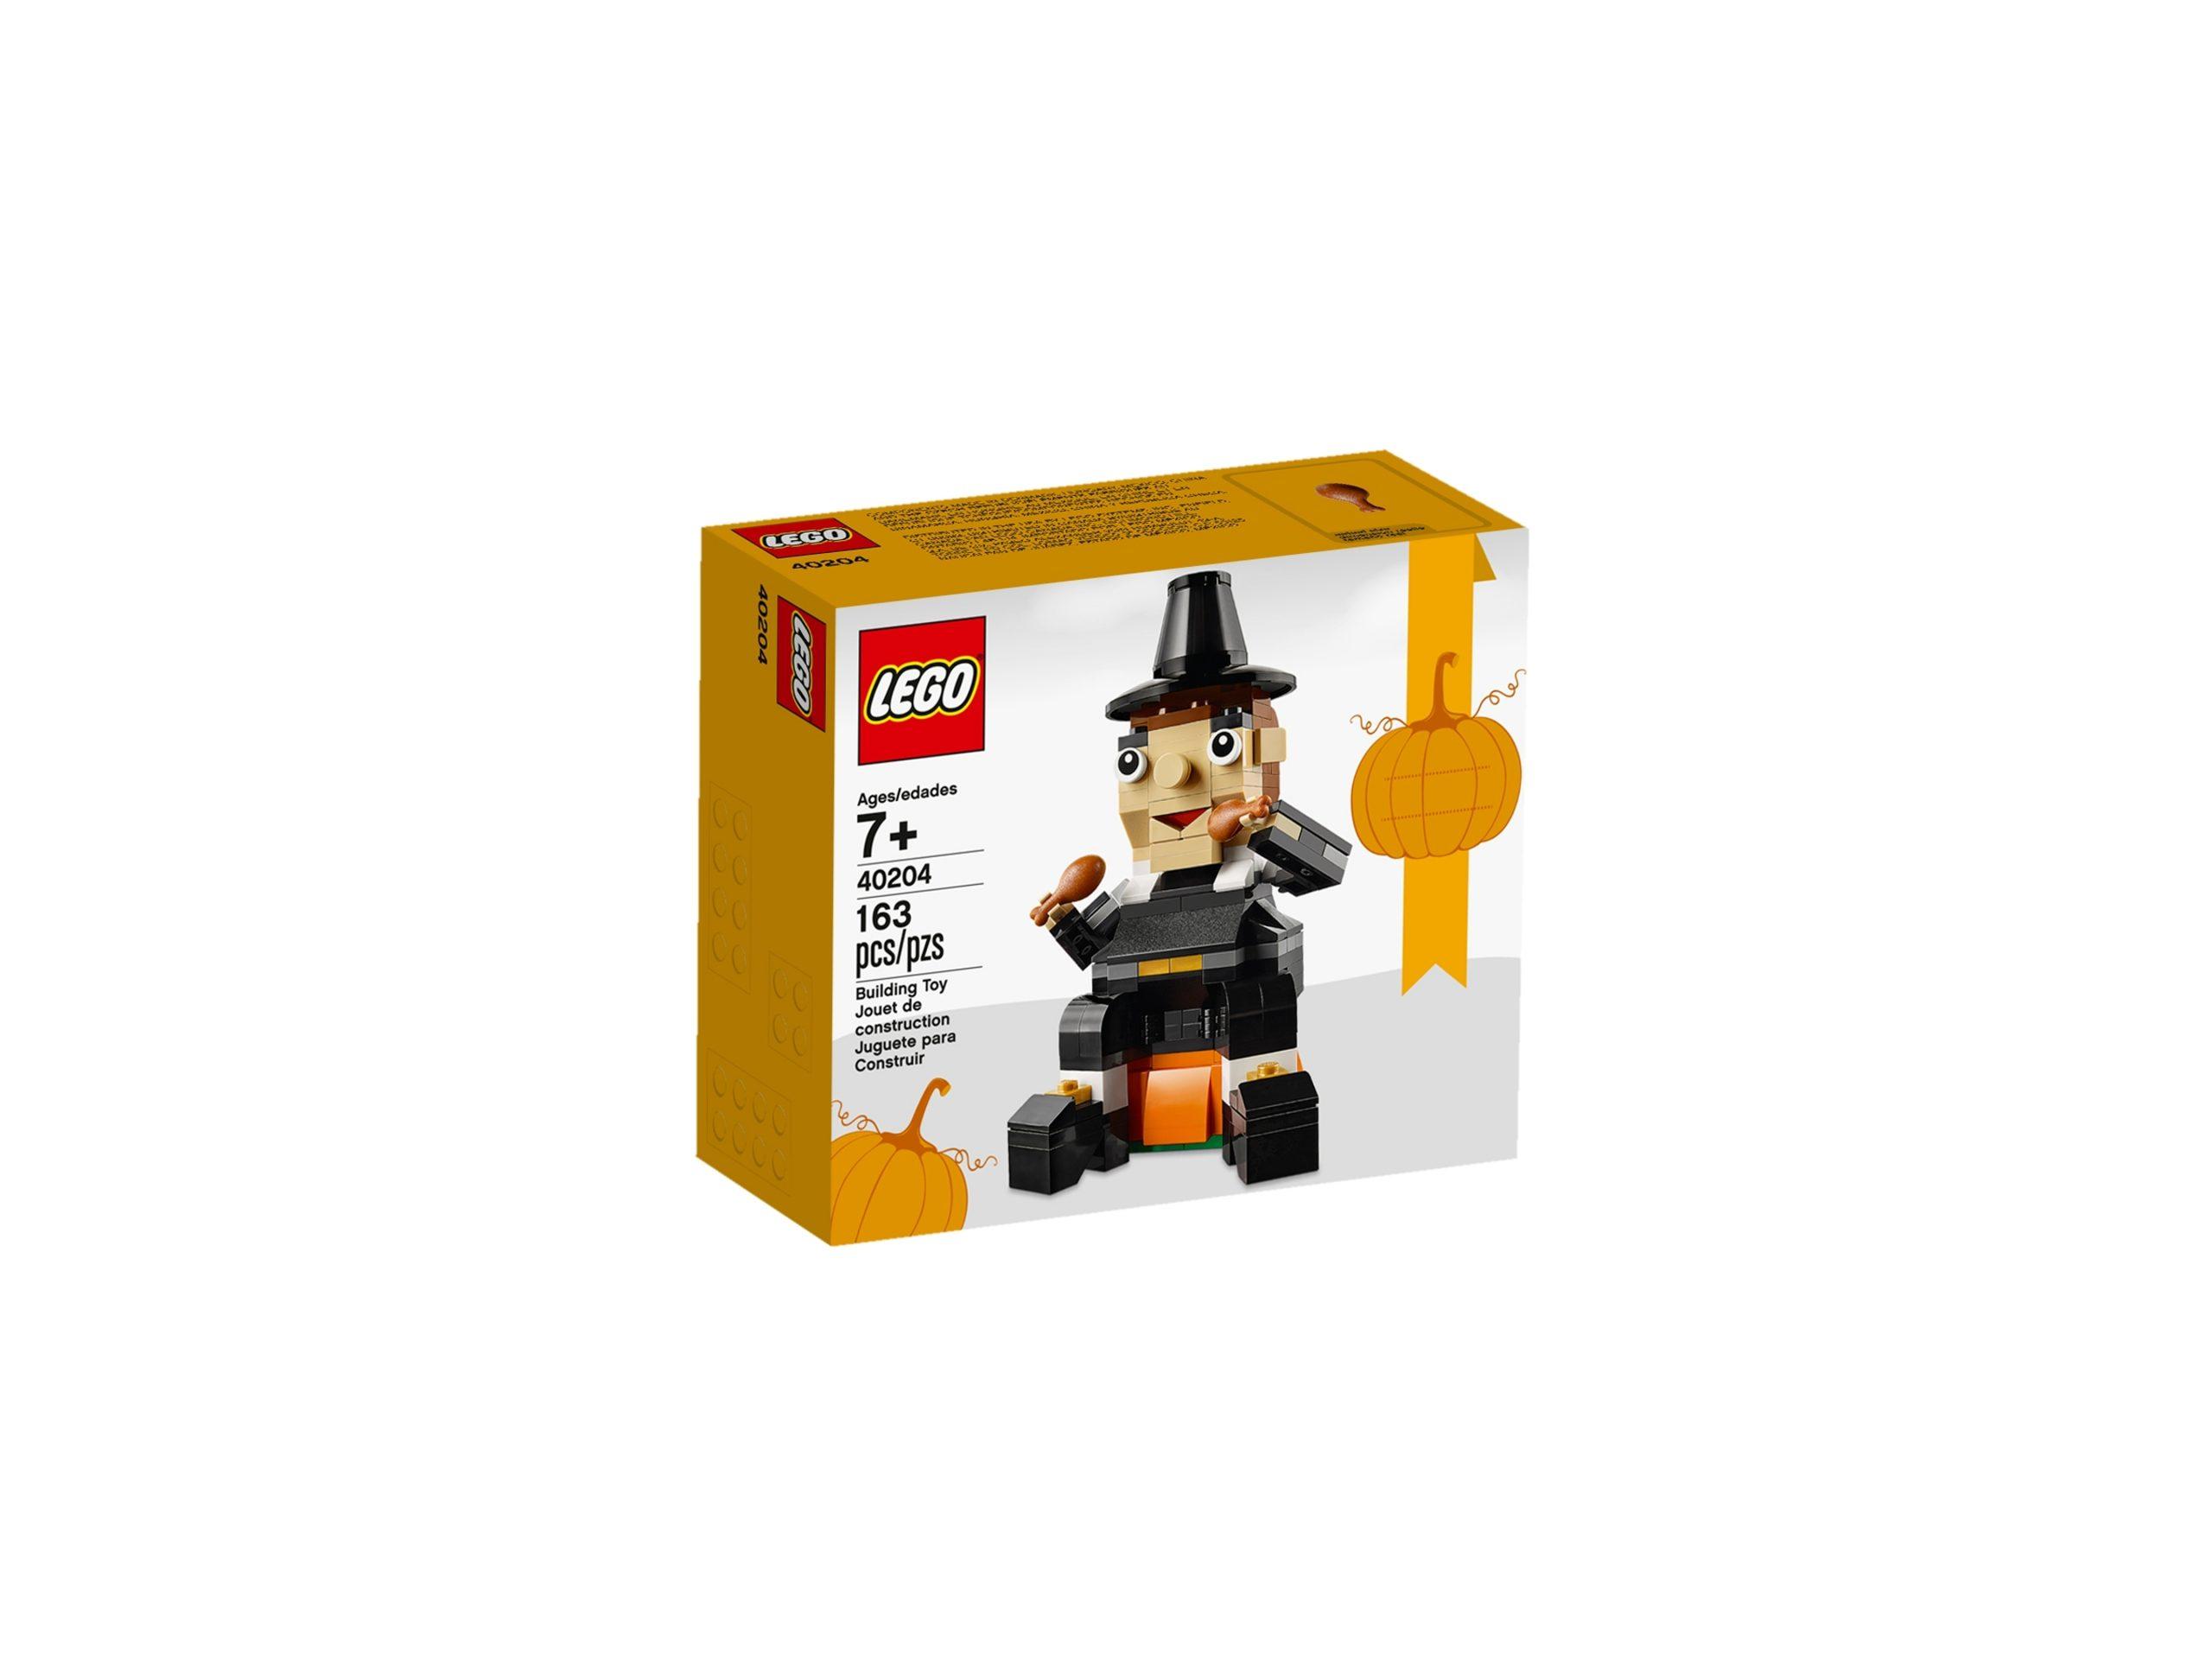 lego 40204 thanksgiving scaled